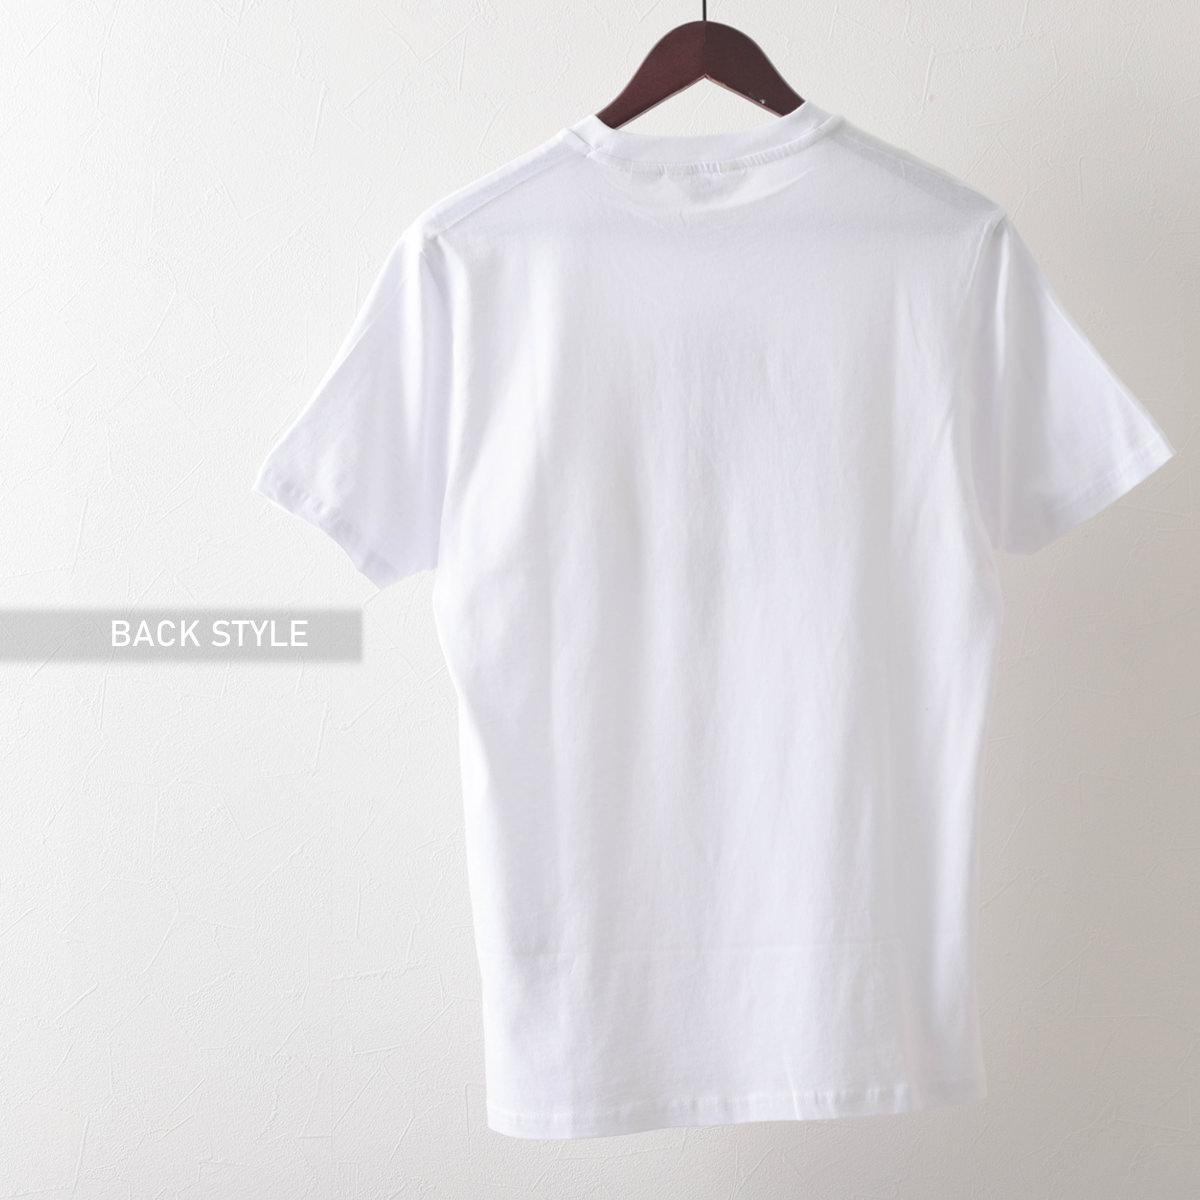 Ben Sherman ベンシャーマン メンズ Tシャツ ペイントターゲットマークプリント 2色 ダークネイビー ホワイト オーガニックコットン レギュラーフィット